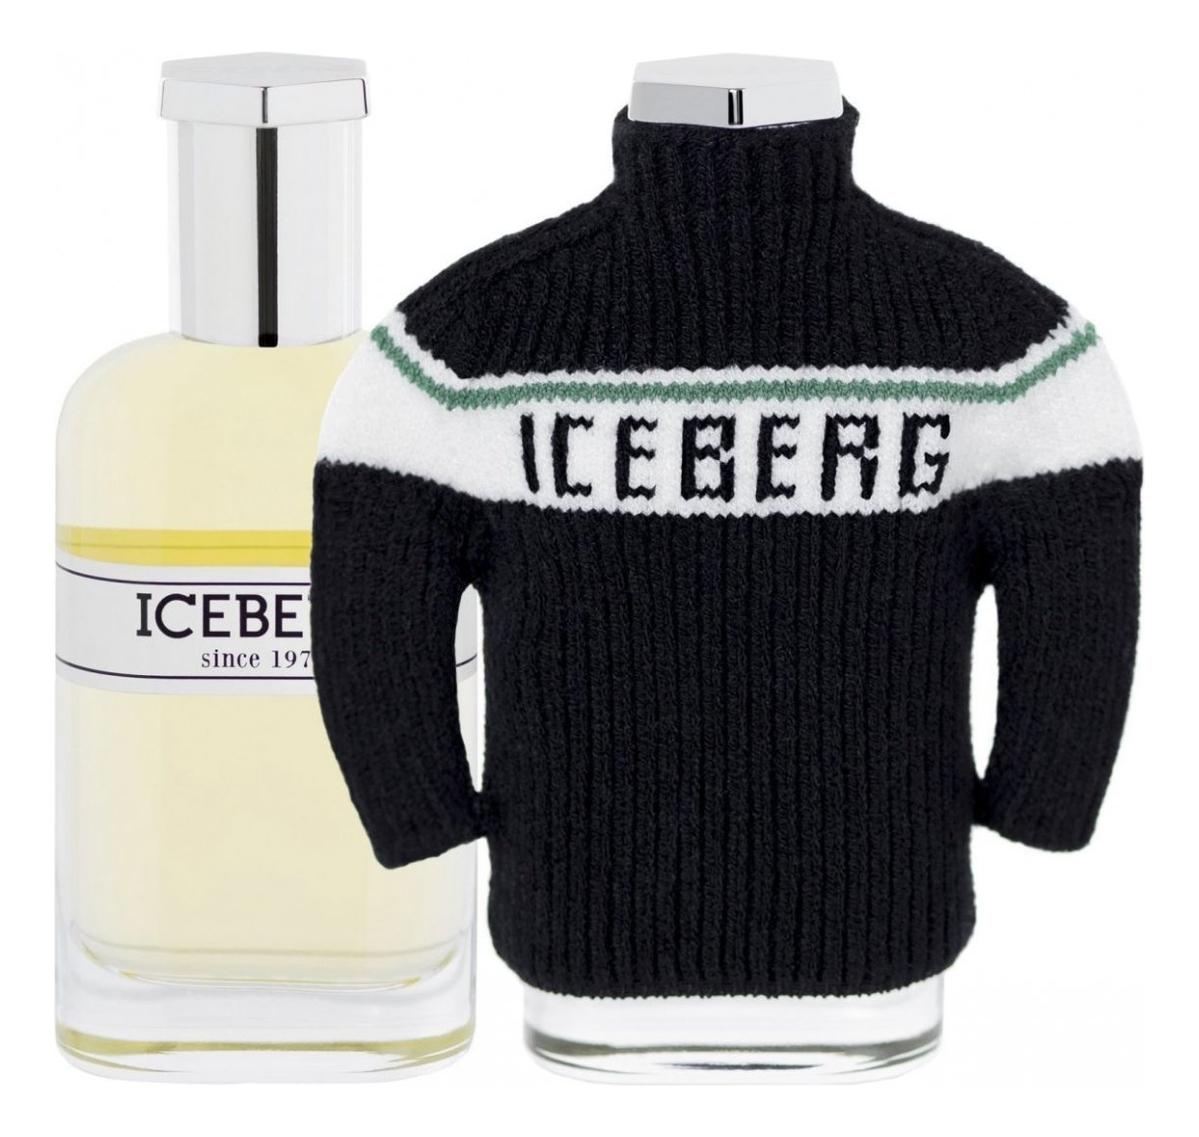 Since 1974 For Him: парфюмерная вода 100мл iceberg the iceberg fragrance парфюмерная вода 100мл тестер